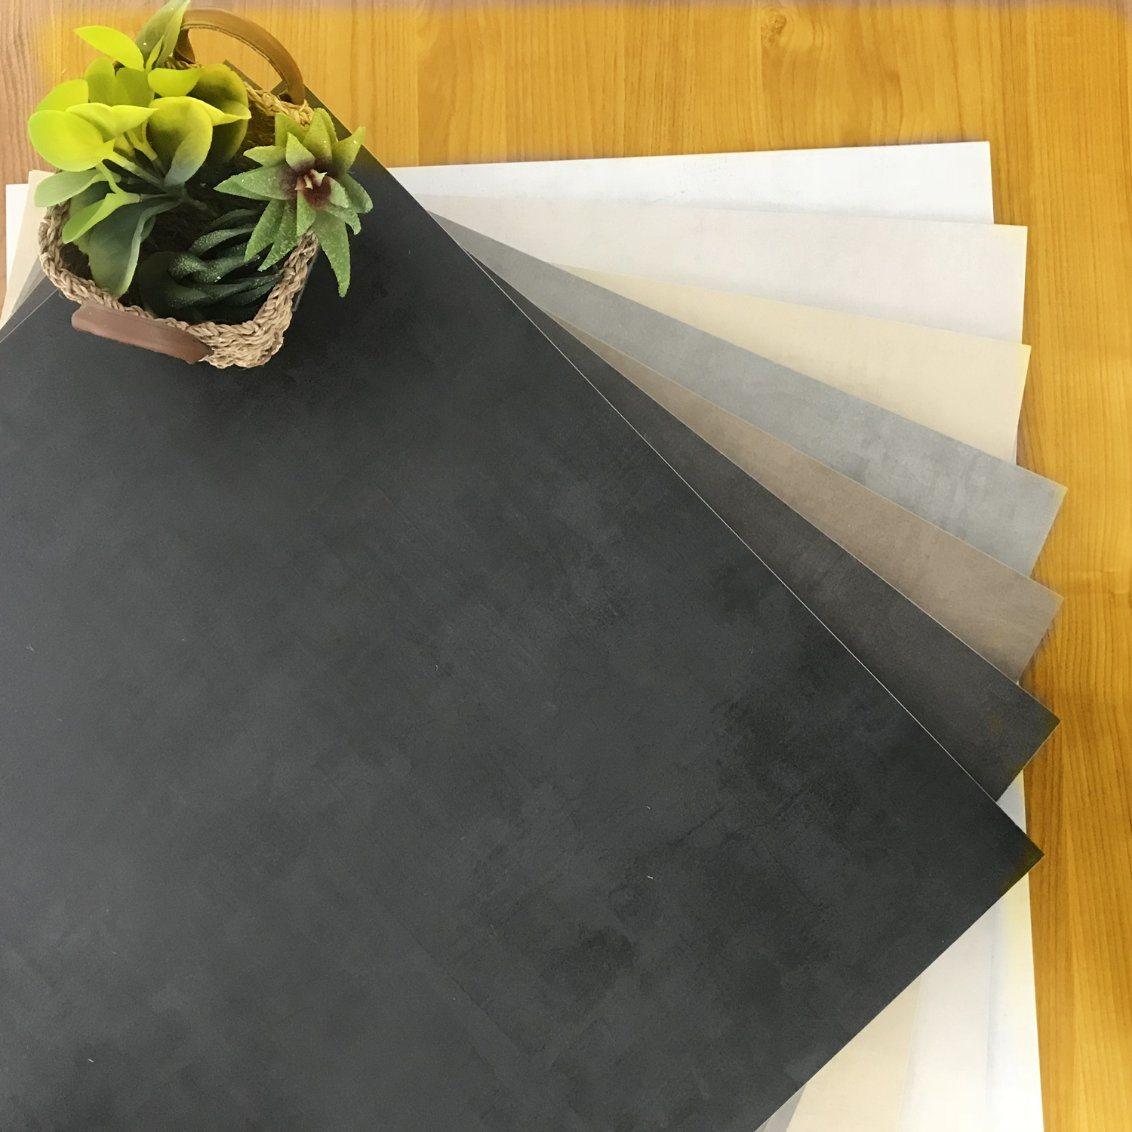 China Roller Technology Glazed Porcelain Floor Tile A6016 Photos